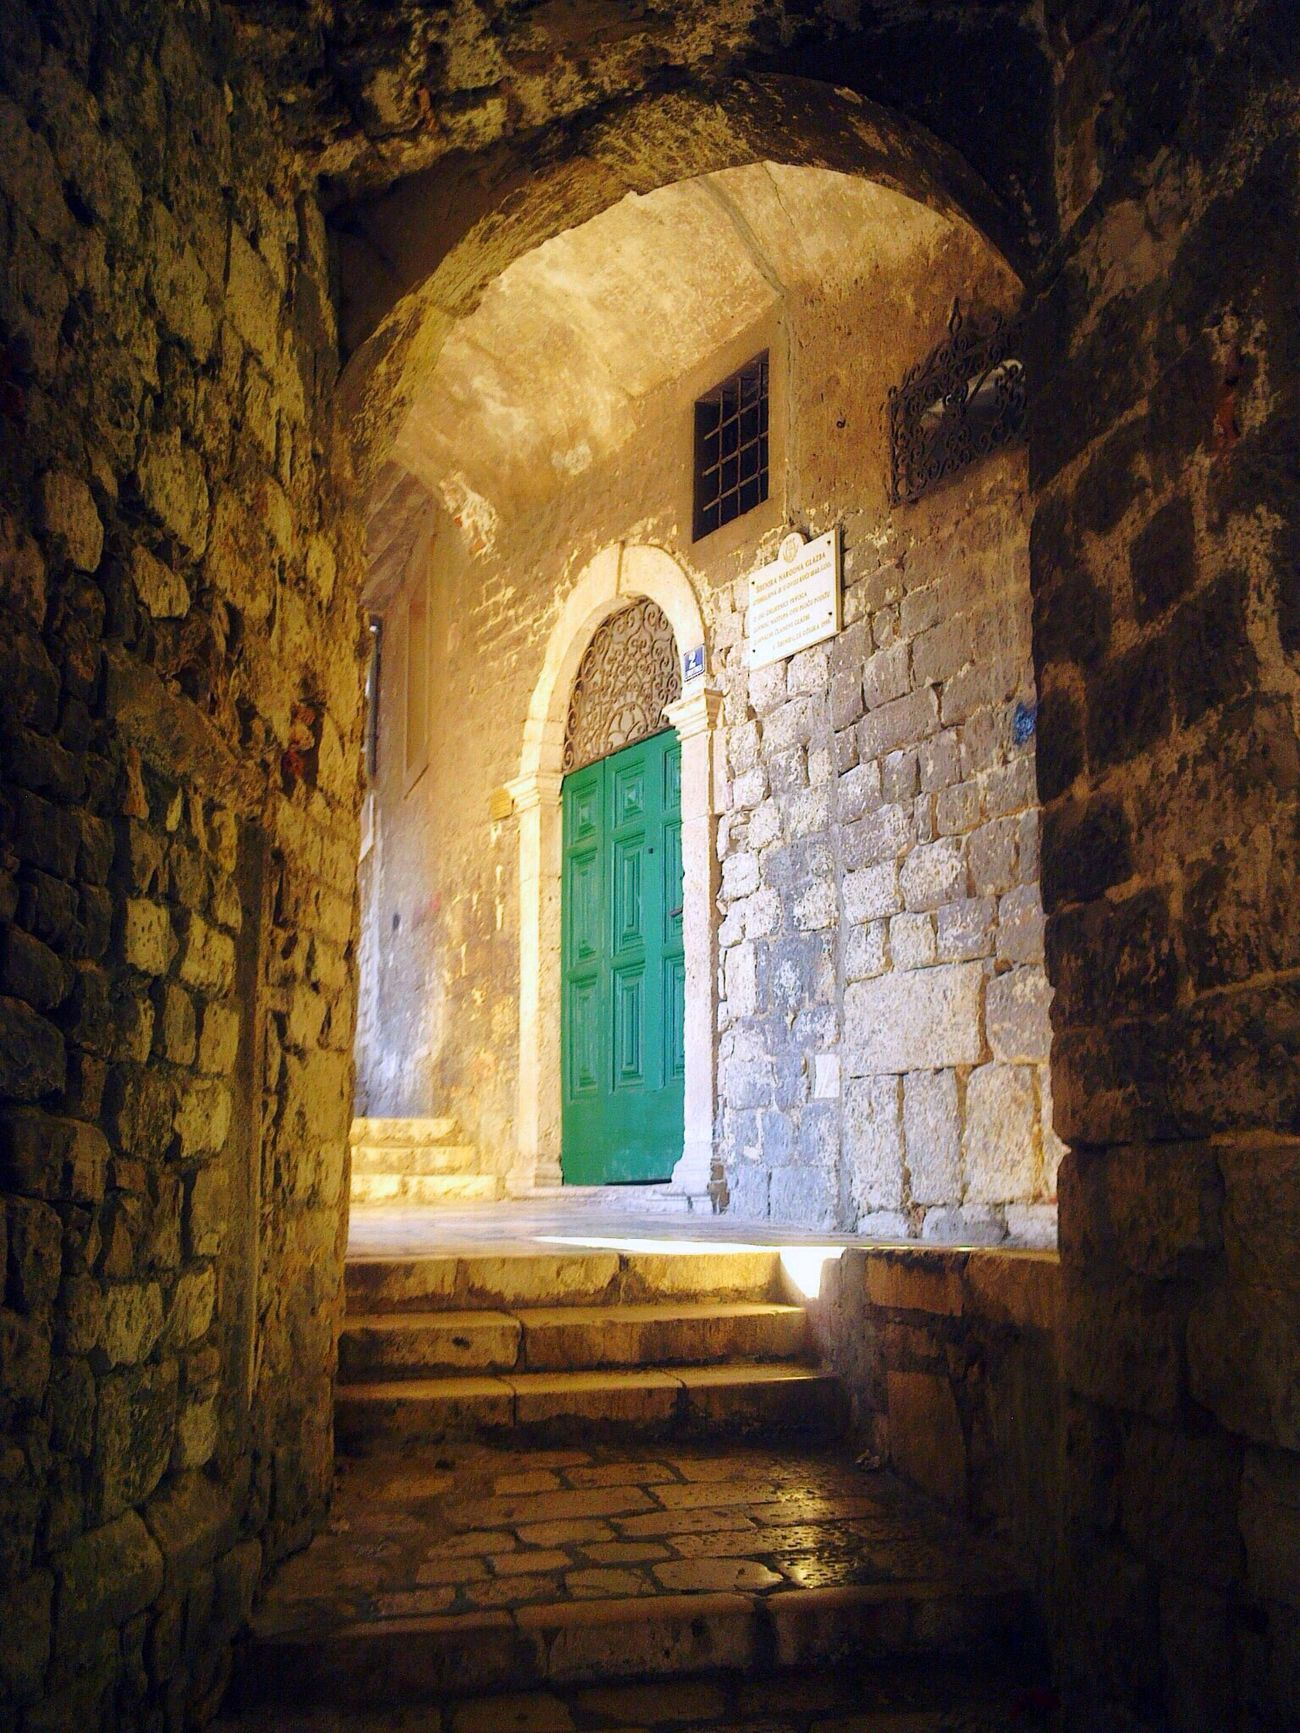 Doors Green Doors Green Color Old Town Croatia Sibenik Stone Walls Sunlight, Shades And Shadows Visiting Historic